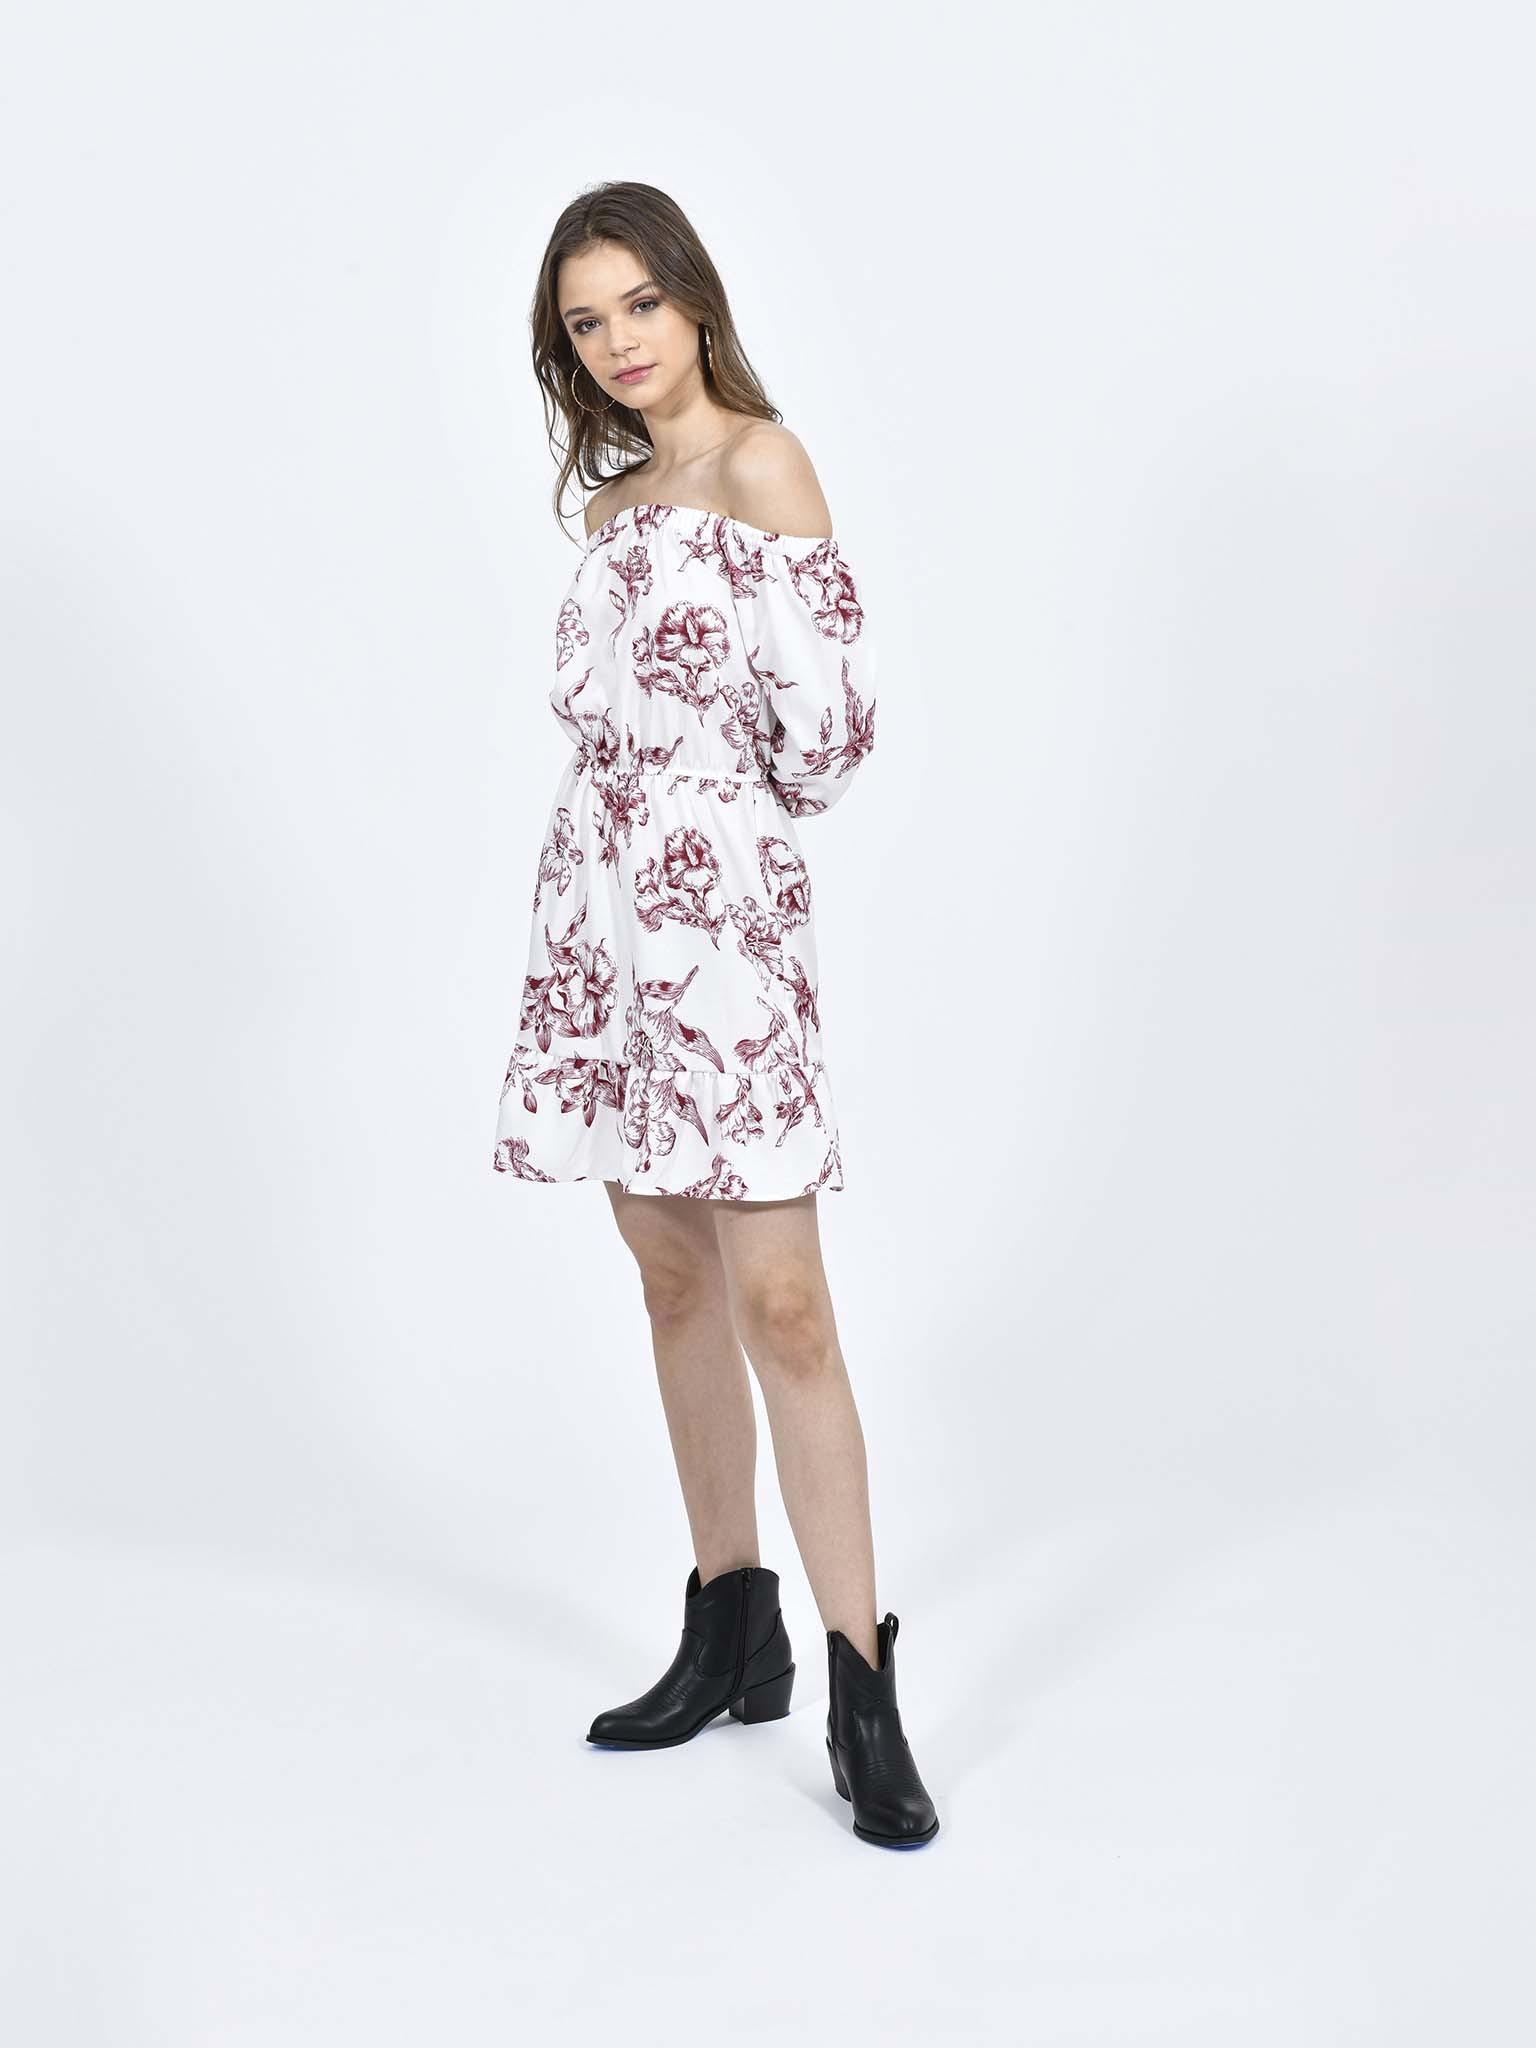 Oferta de Vestido Hombros Descubiertos por $259